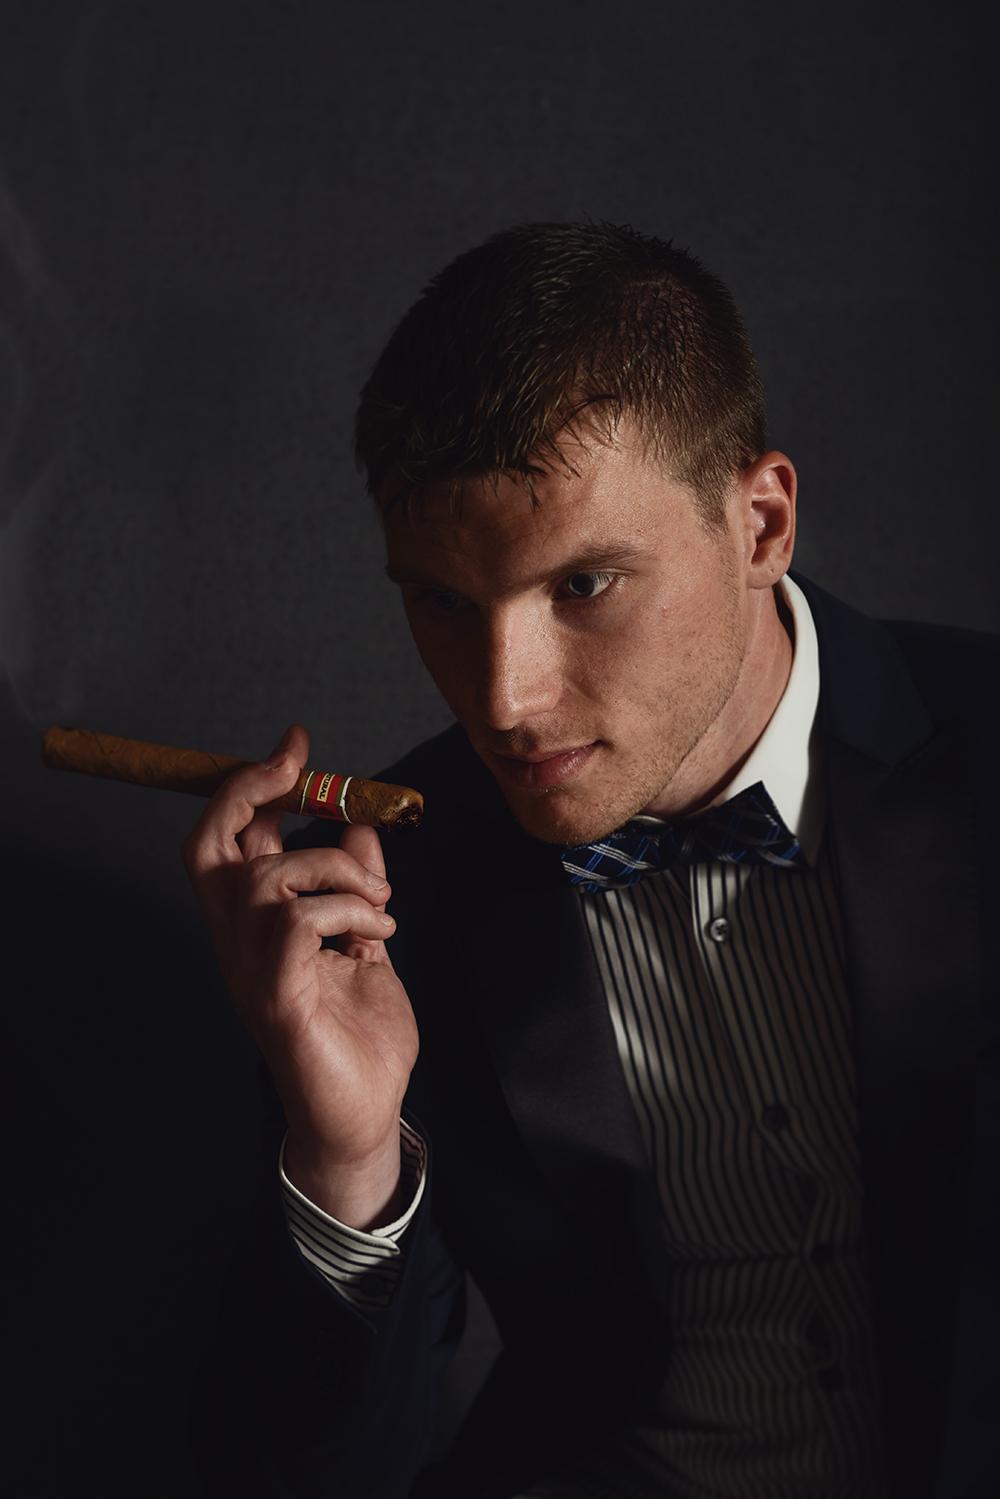 advertising-poses-men-cigar-rugged